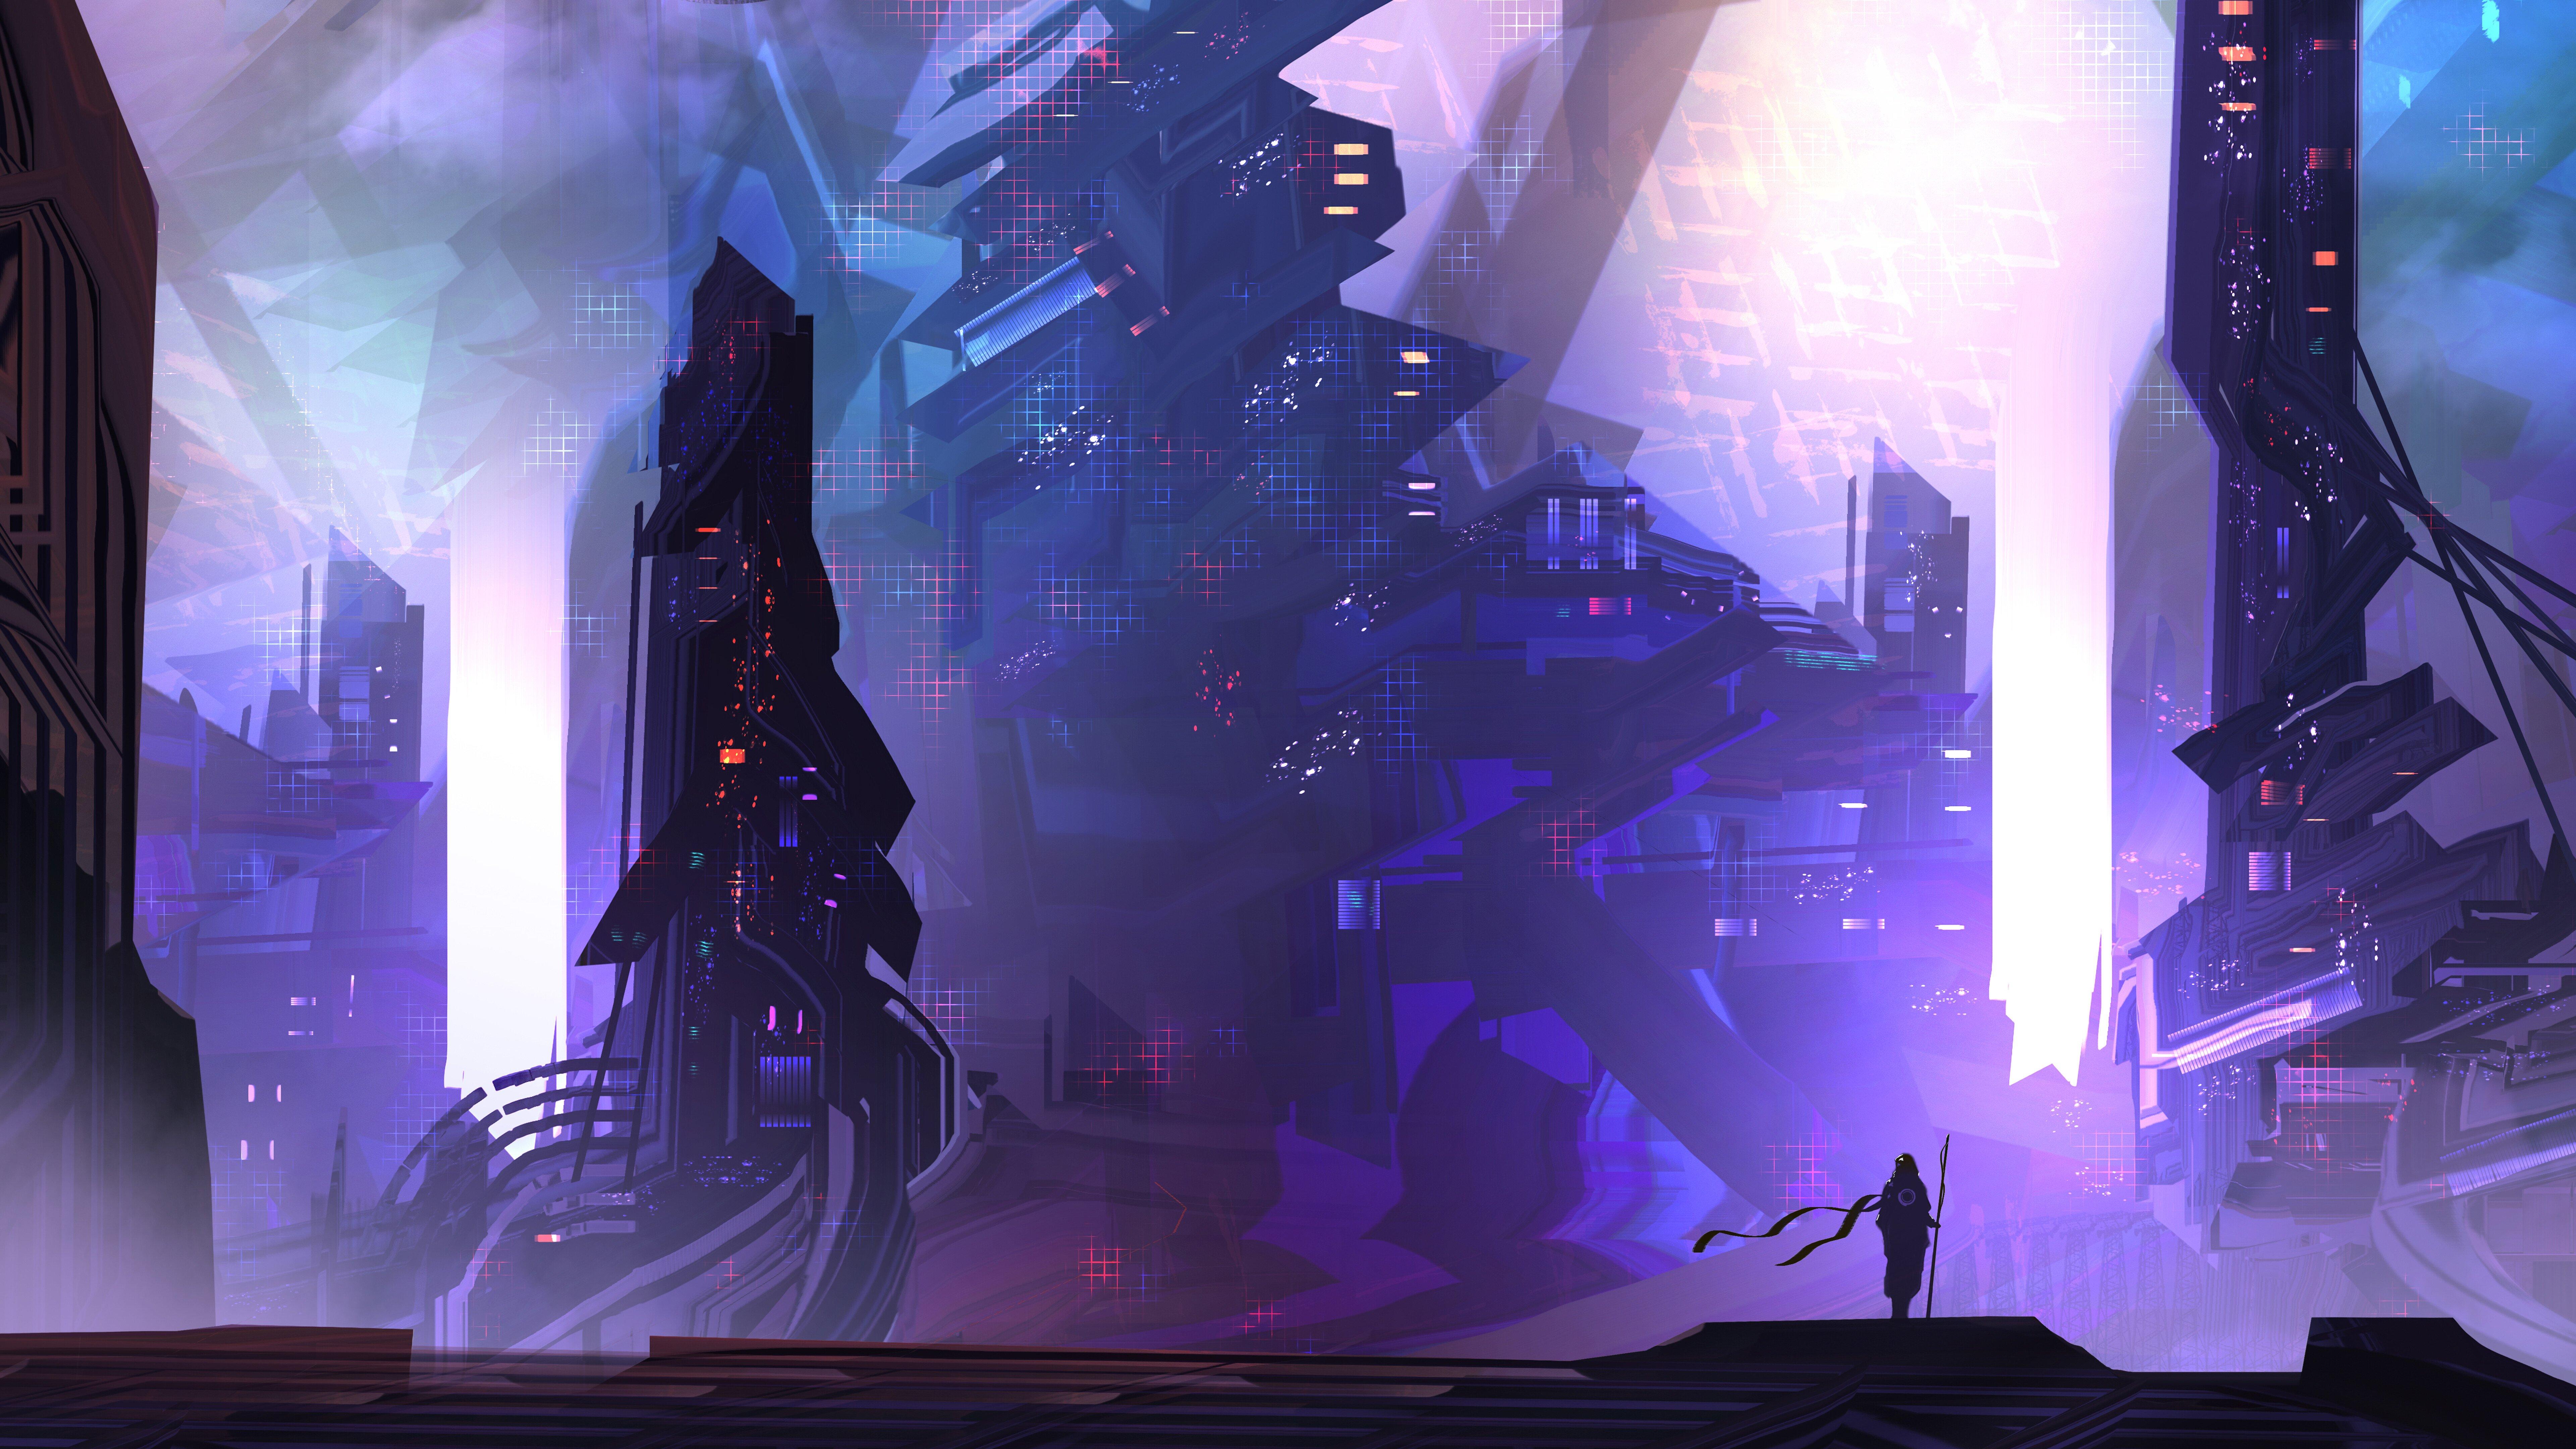 Wallpaper Science fiction city digital art